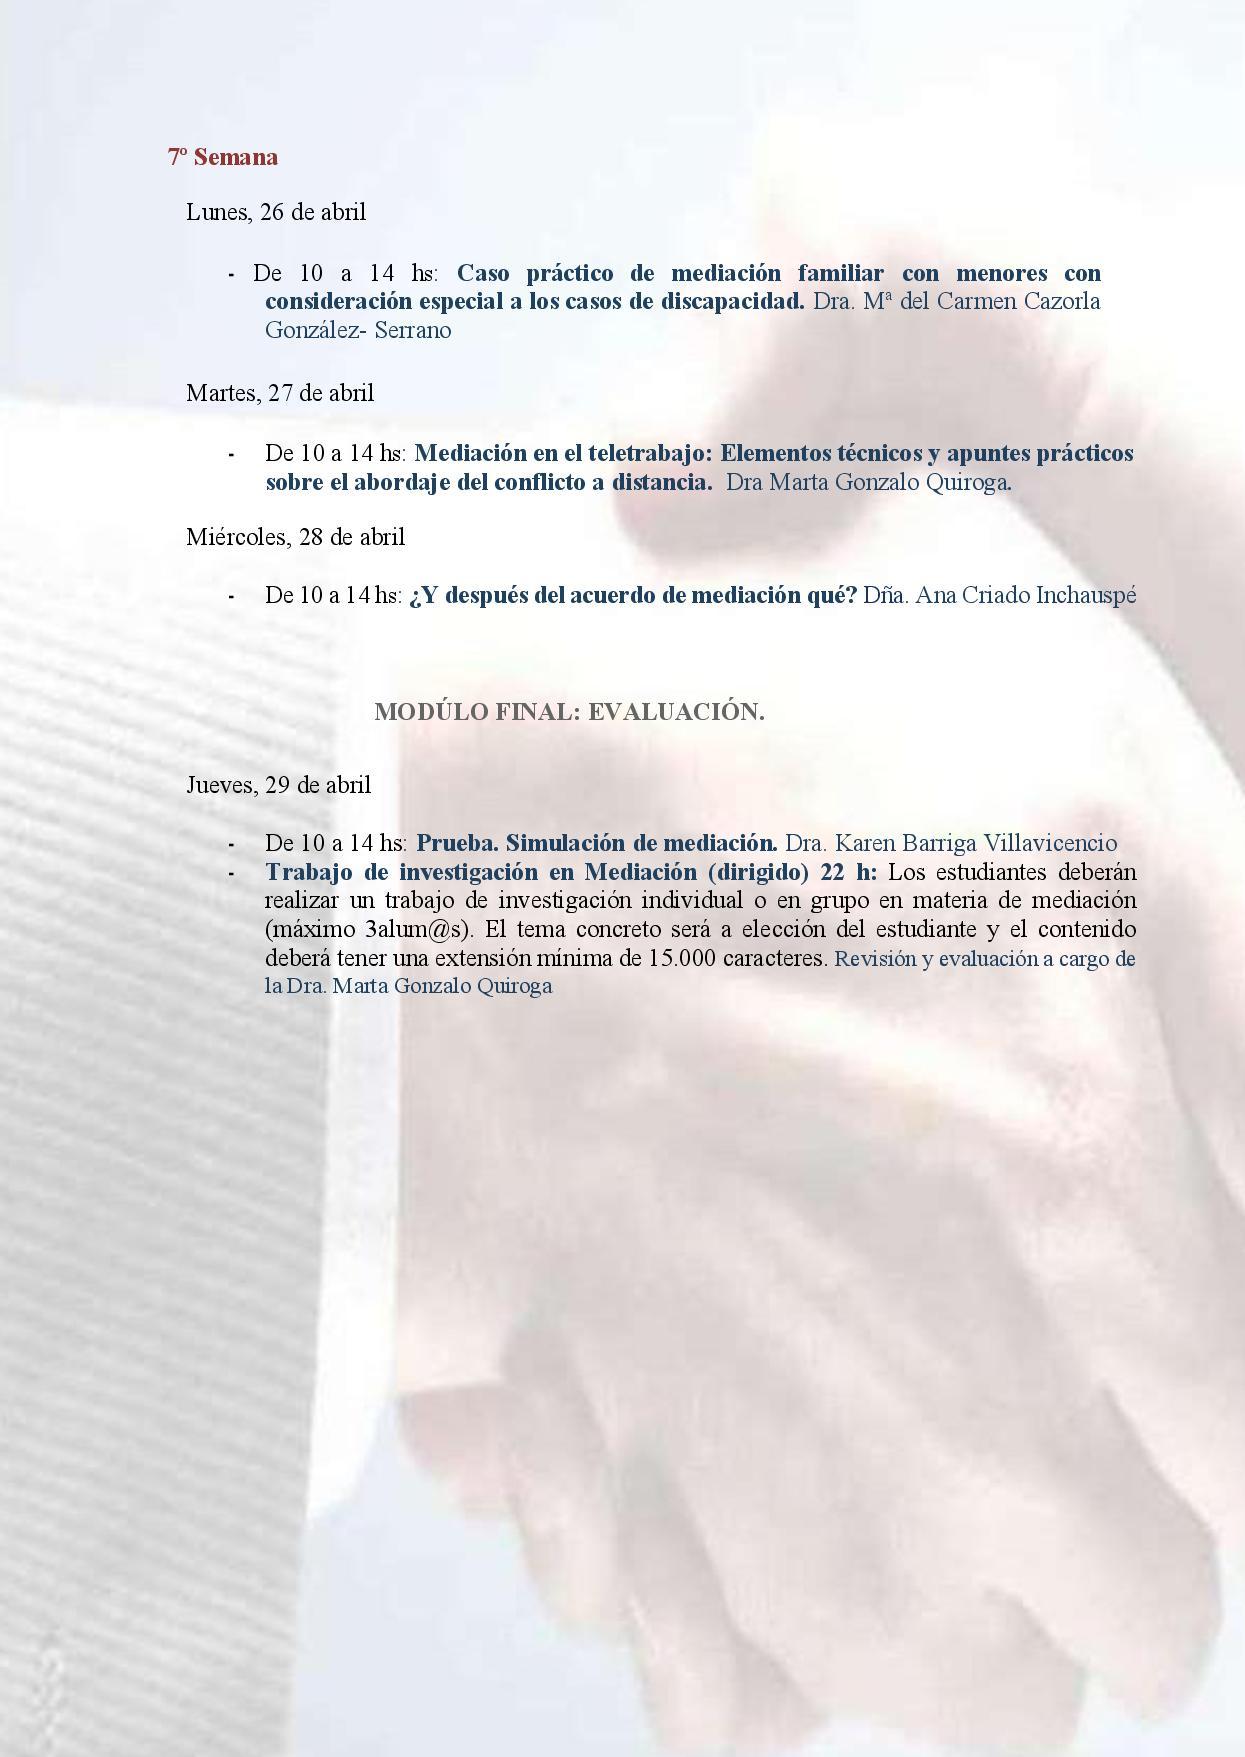 Programa-page-006